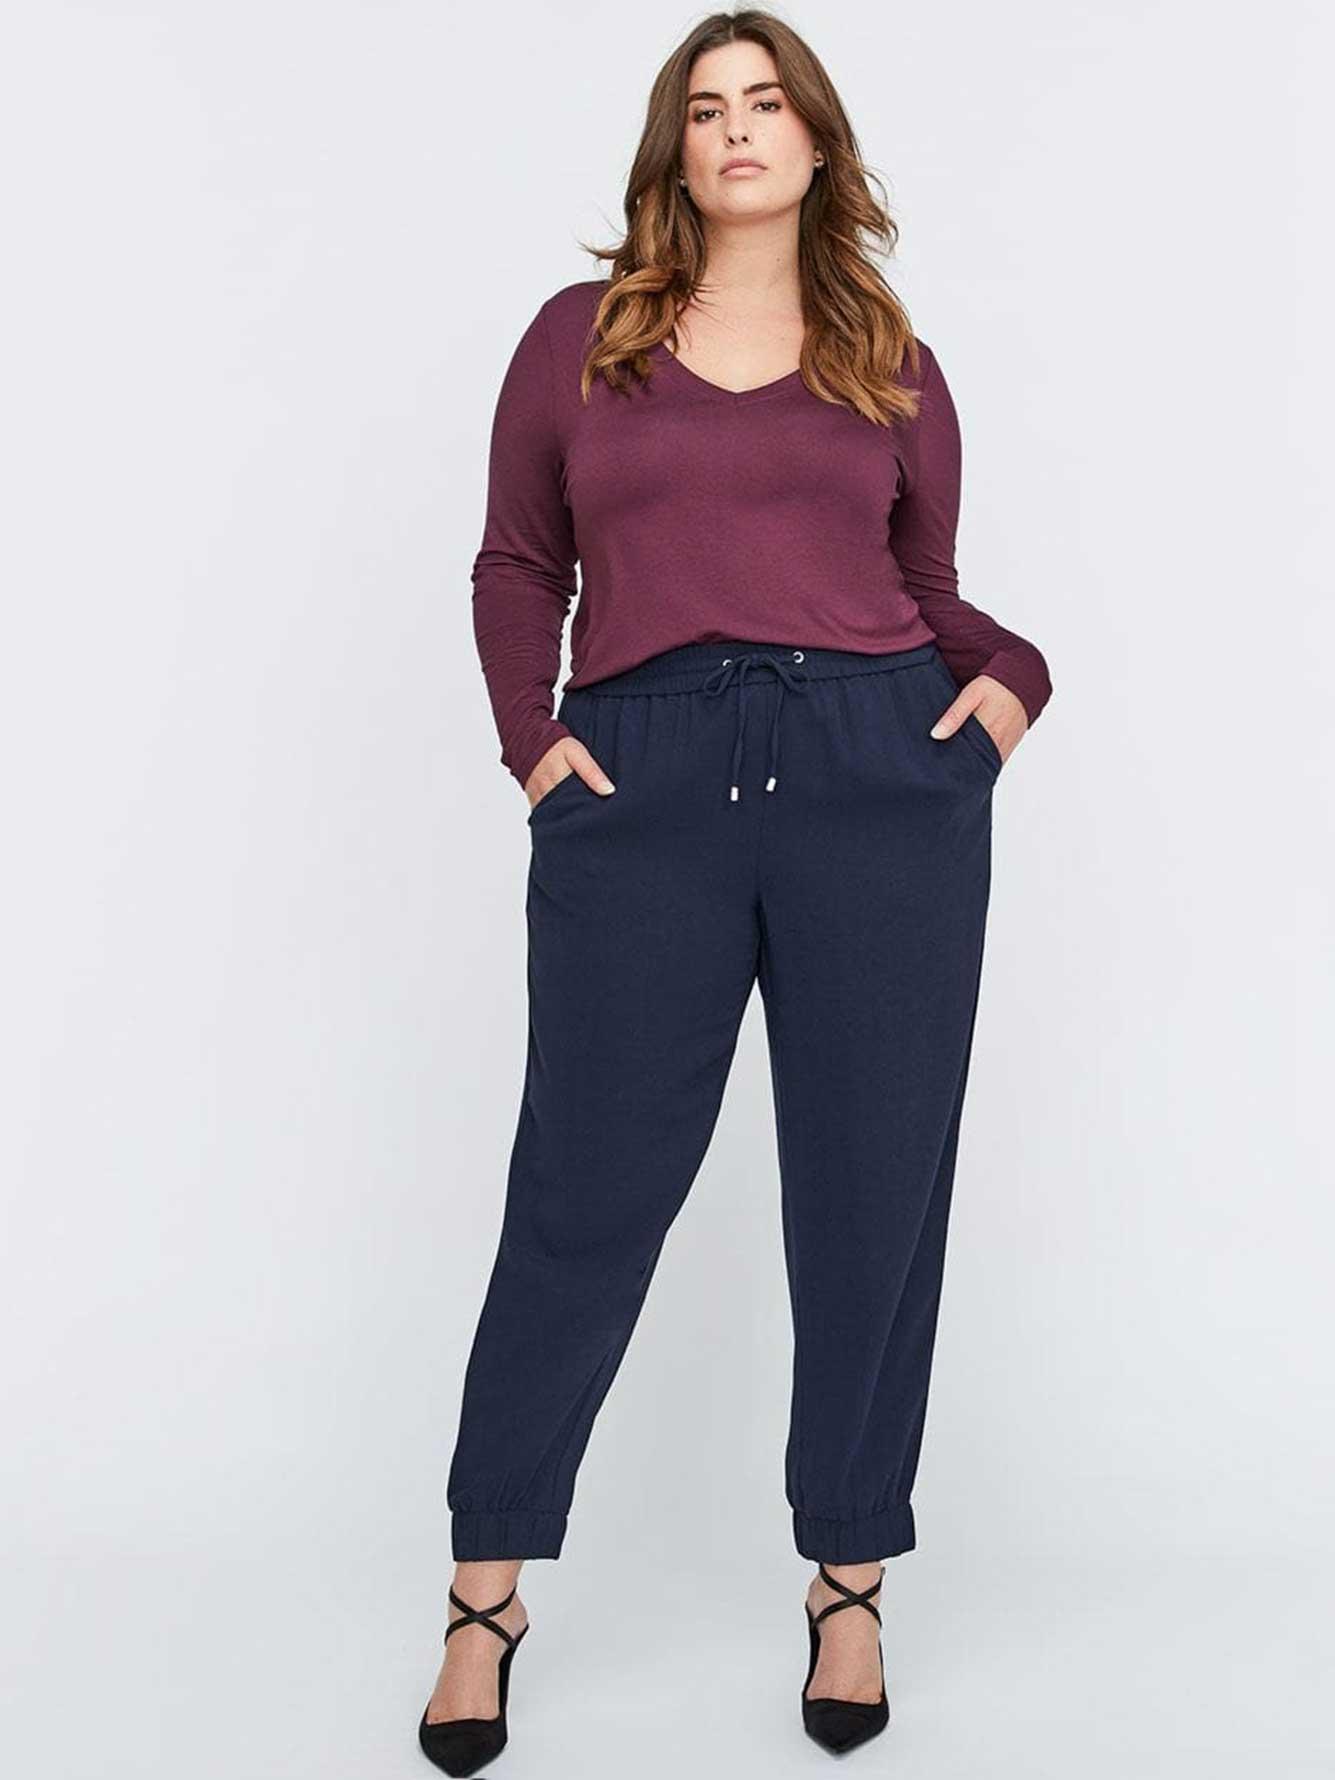 ea60490bd87 Womens Elletm Pull On Ankle Dress Pants